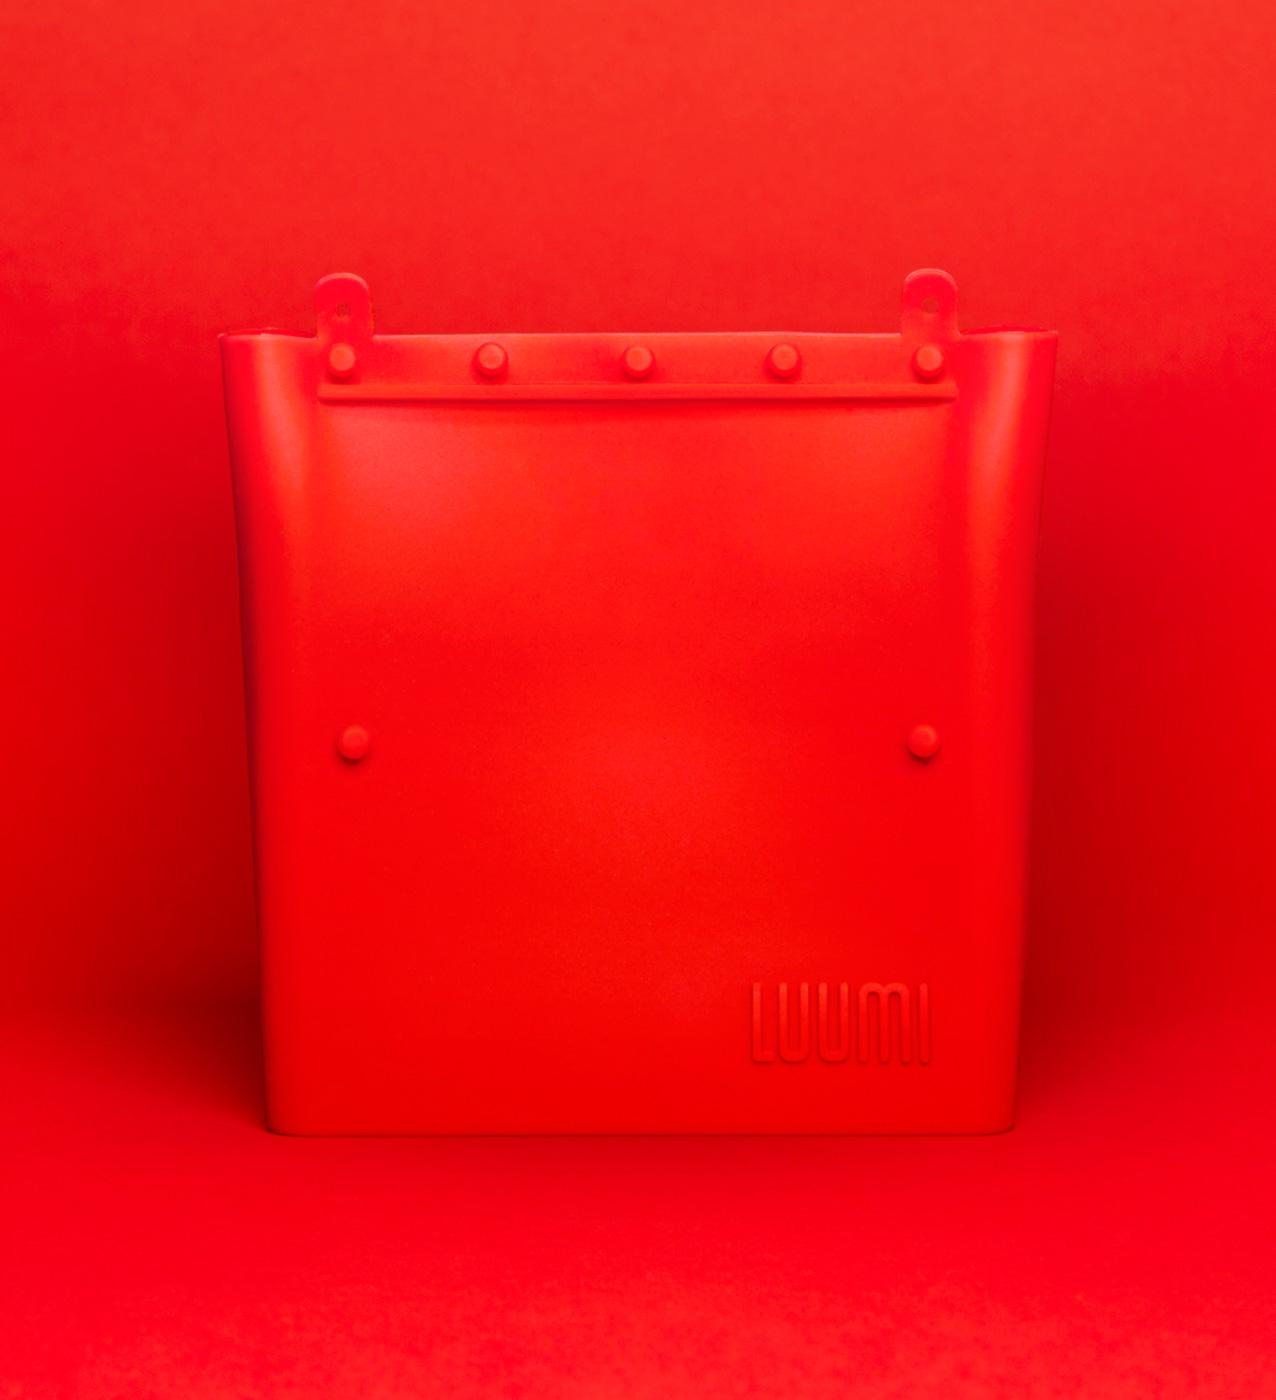 luumi-red